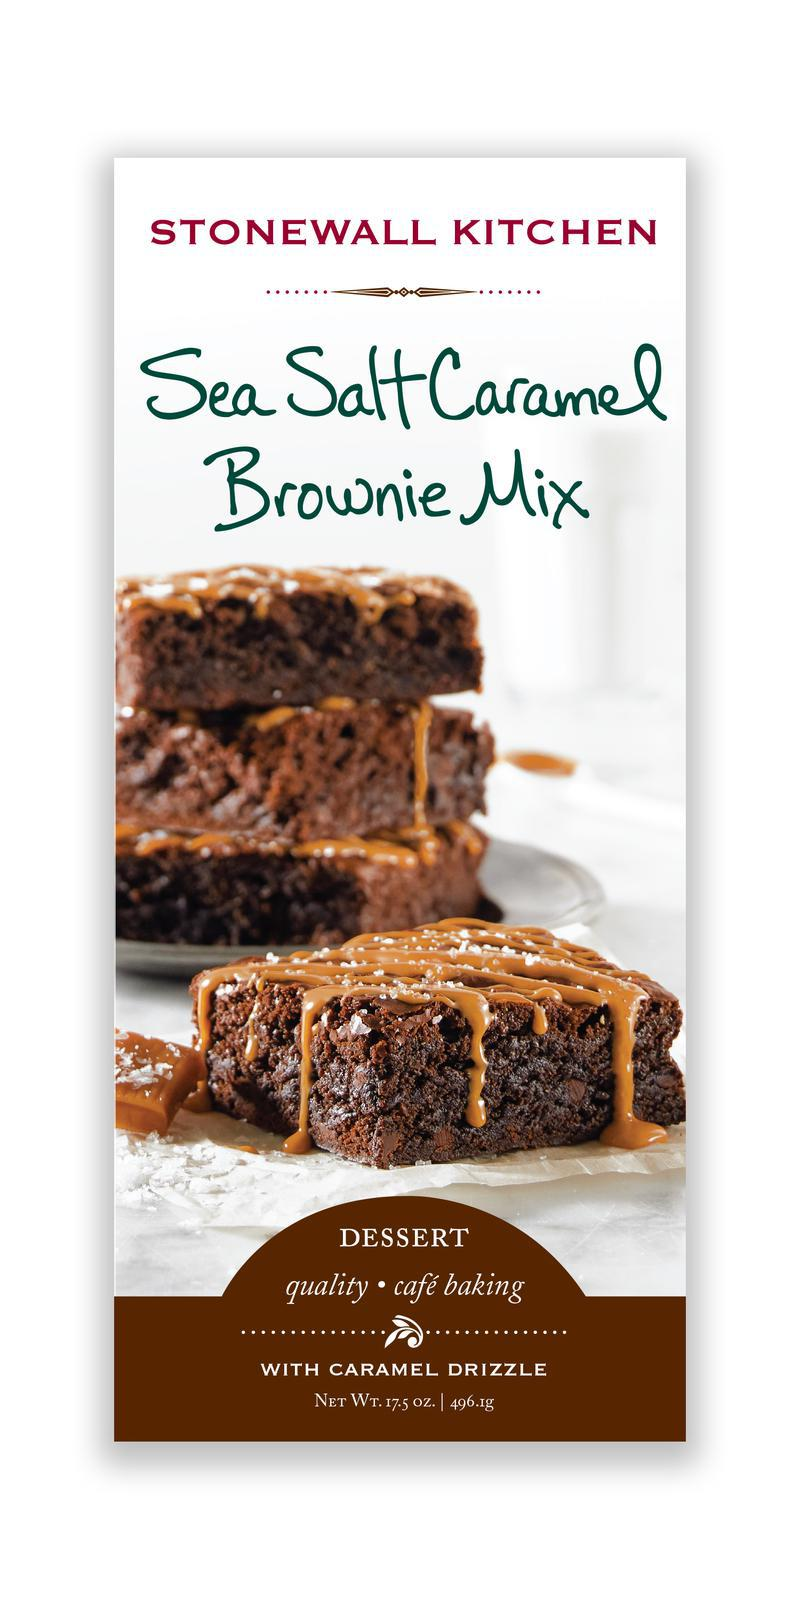 Stonewall Kitchen Sea Salt Caramel Brownie Mix Product Marketplace